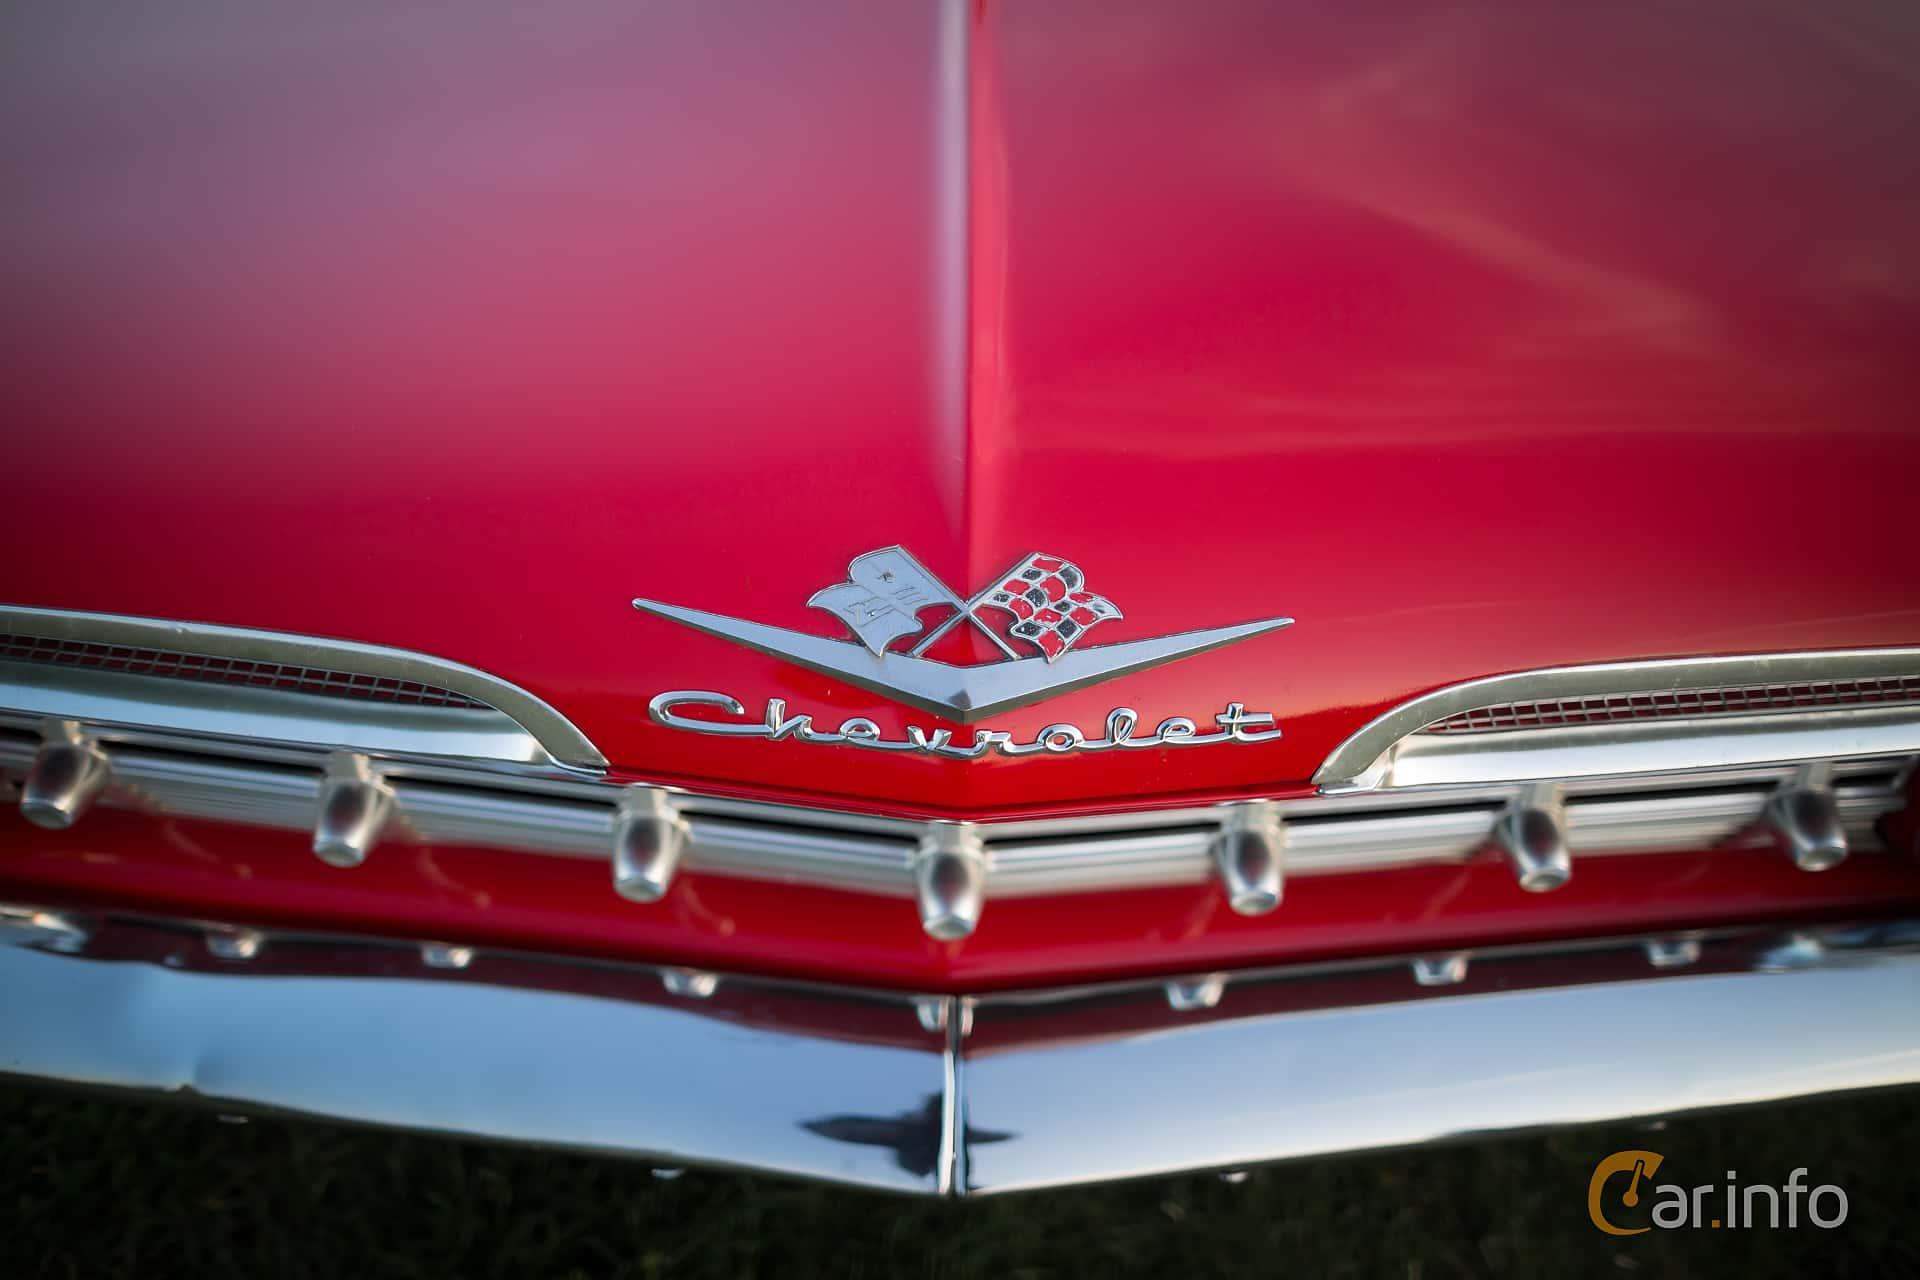 Chevrolet Impala Convertible 3.9 Powerglide, 137hp, 1959 at Tisdagsträffarna Vikingatider v.38 / 2014